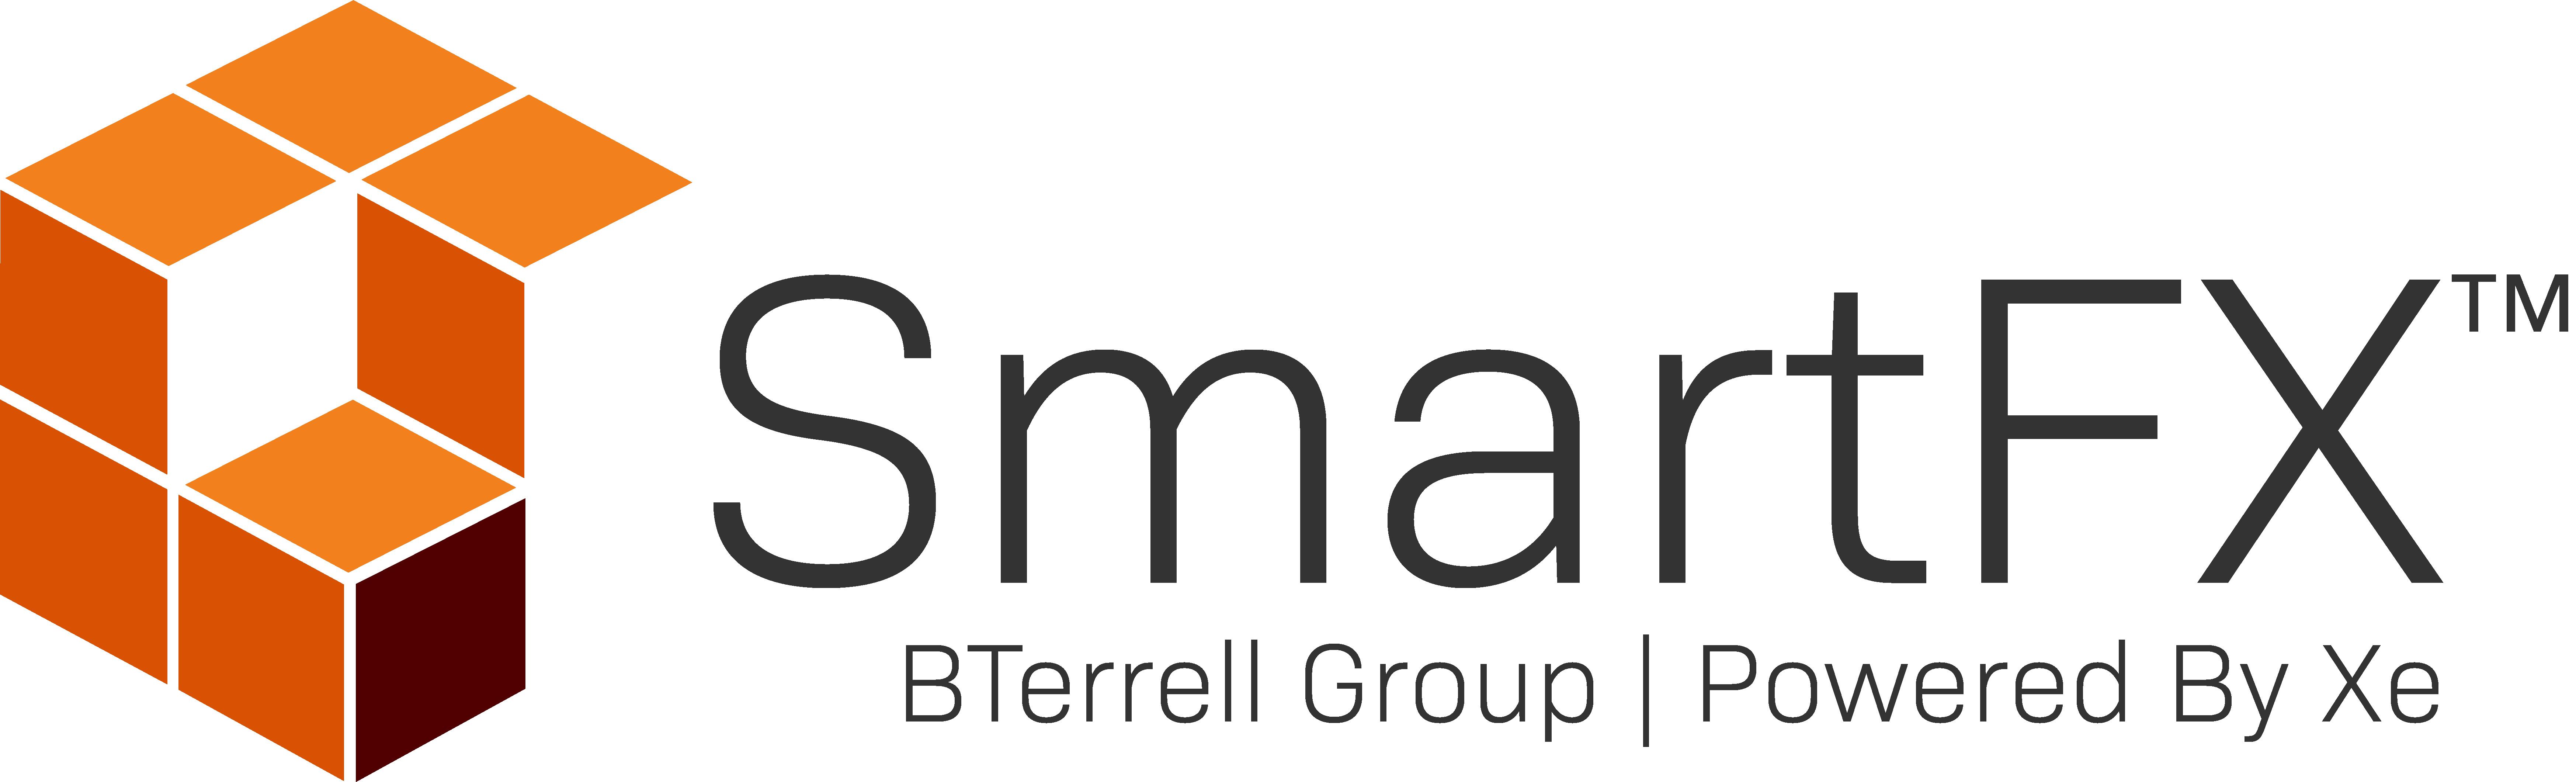 20210111_BT_SmartFX Logo_Horz_light background